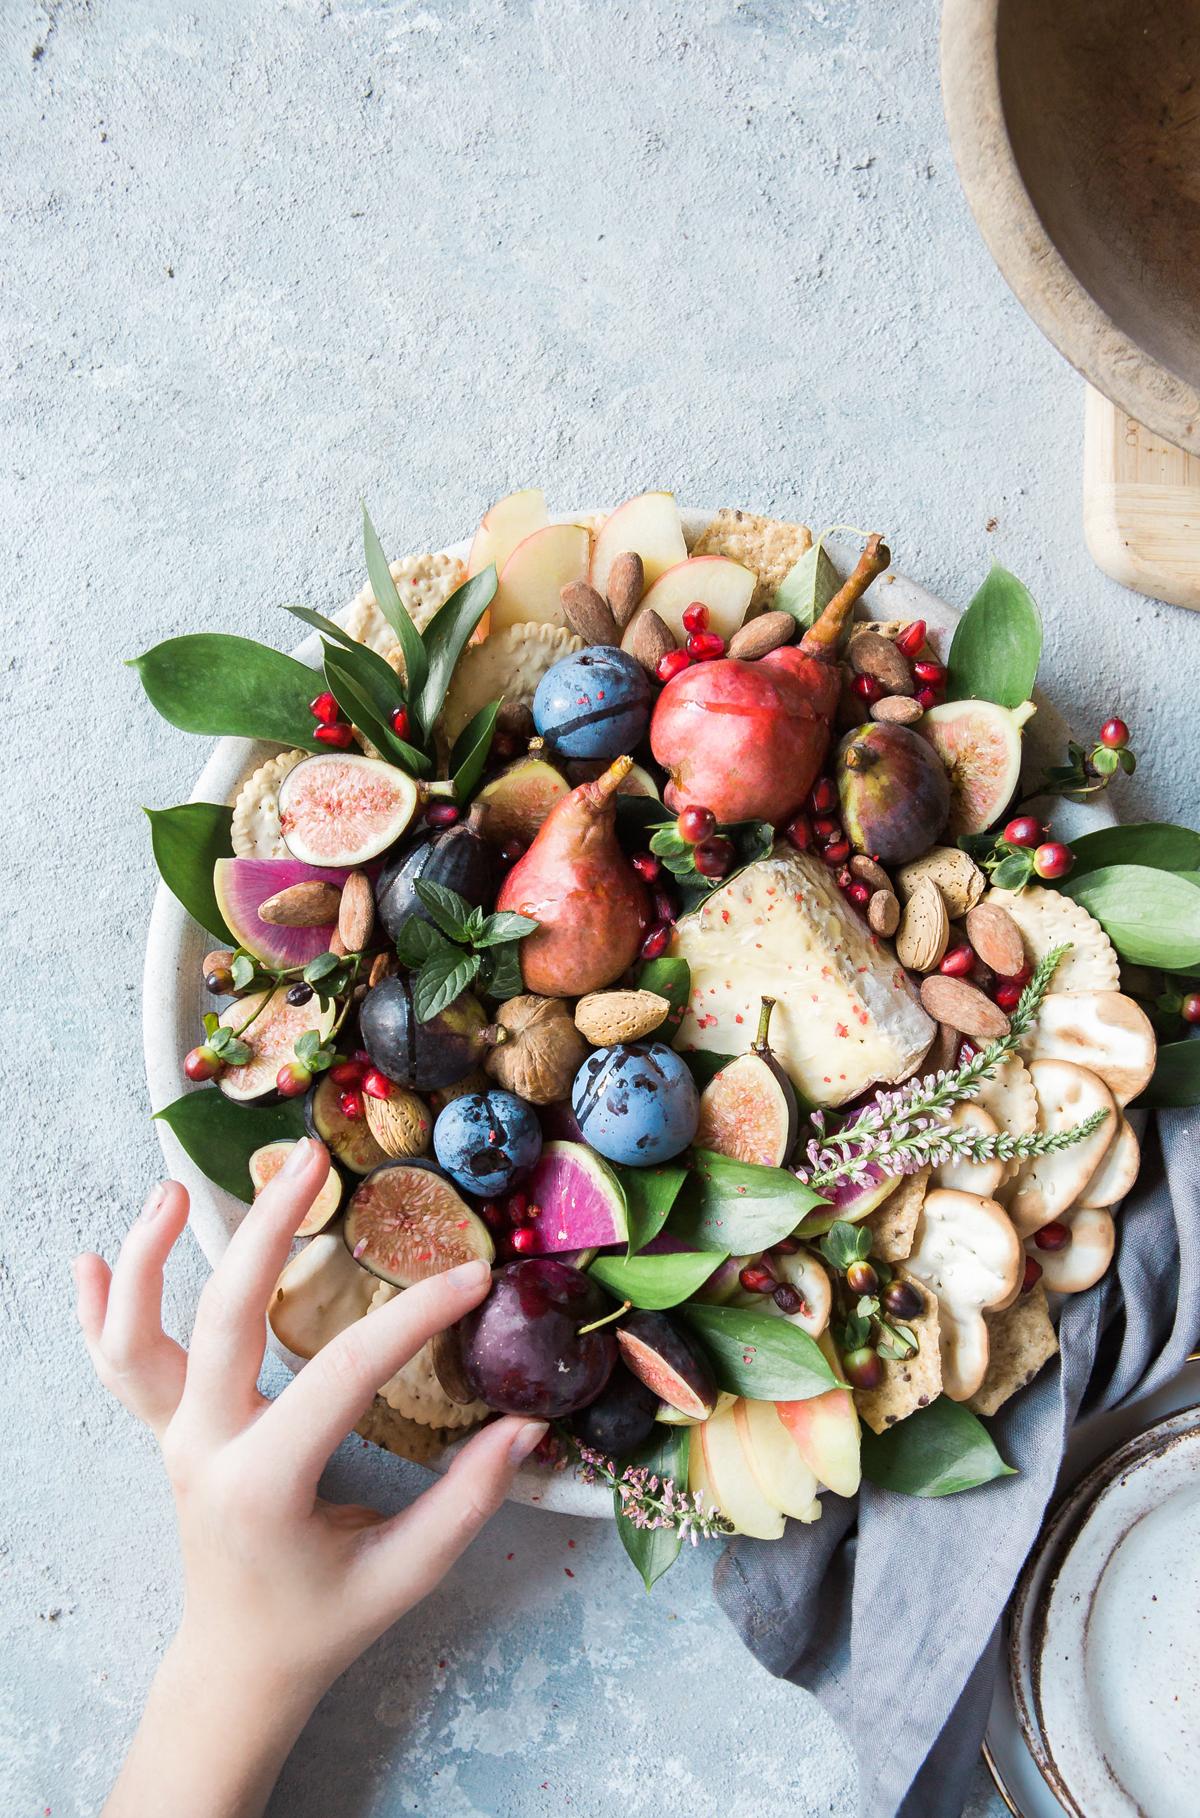 Mangiar sano e naturale